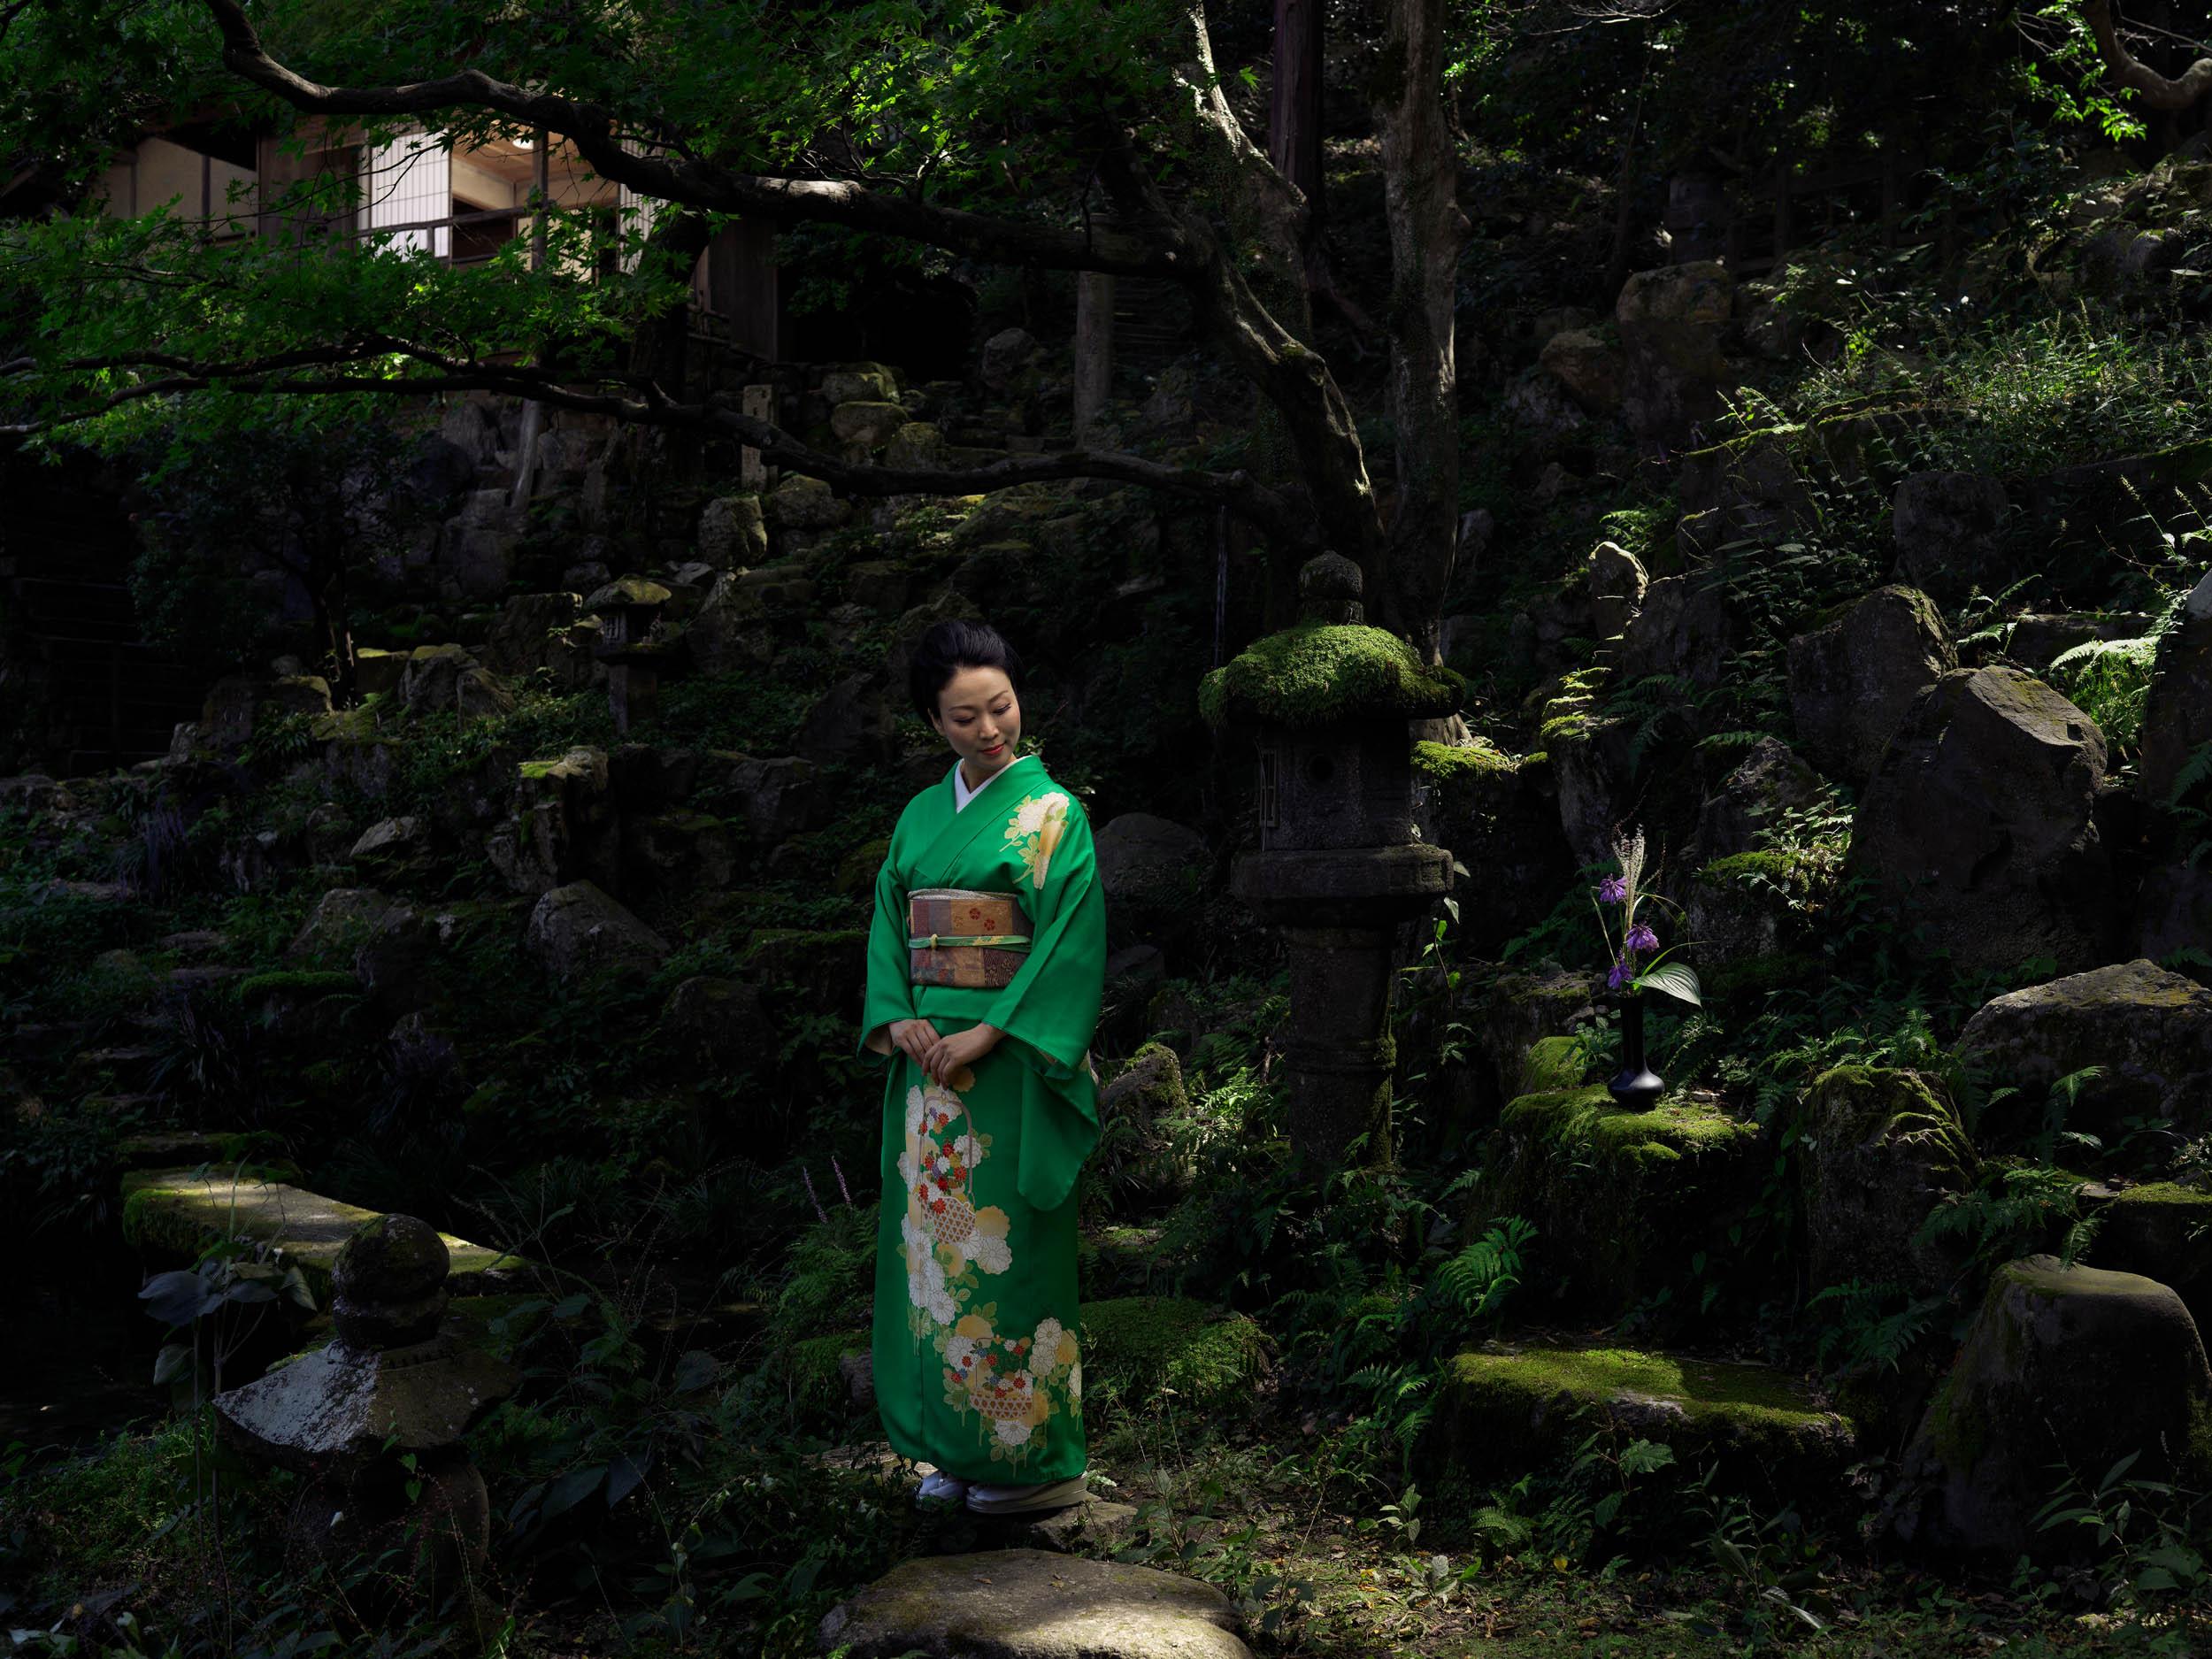 Junko Okimoto